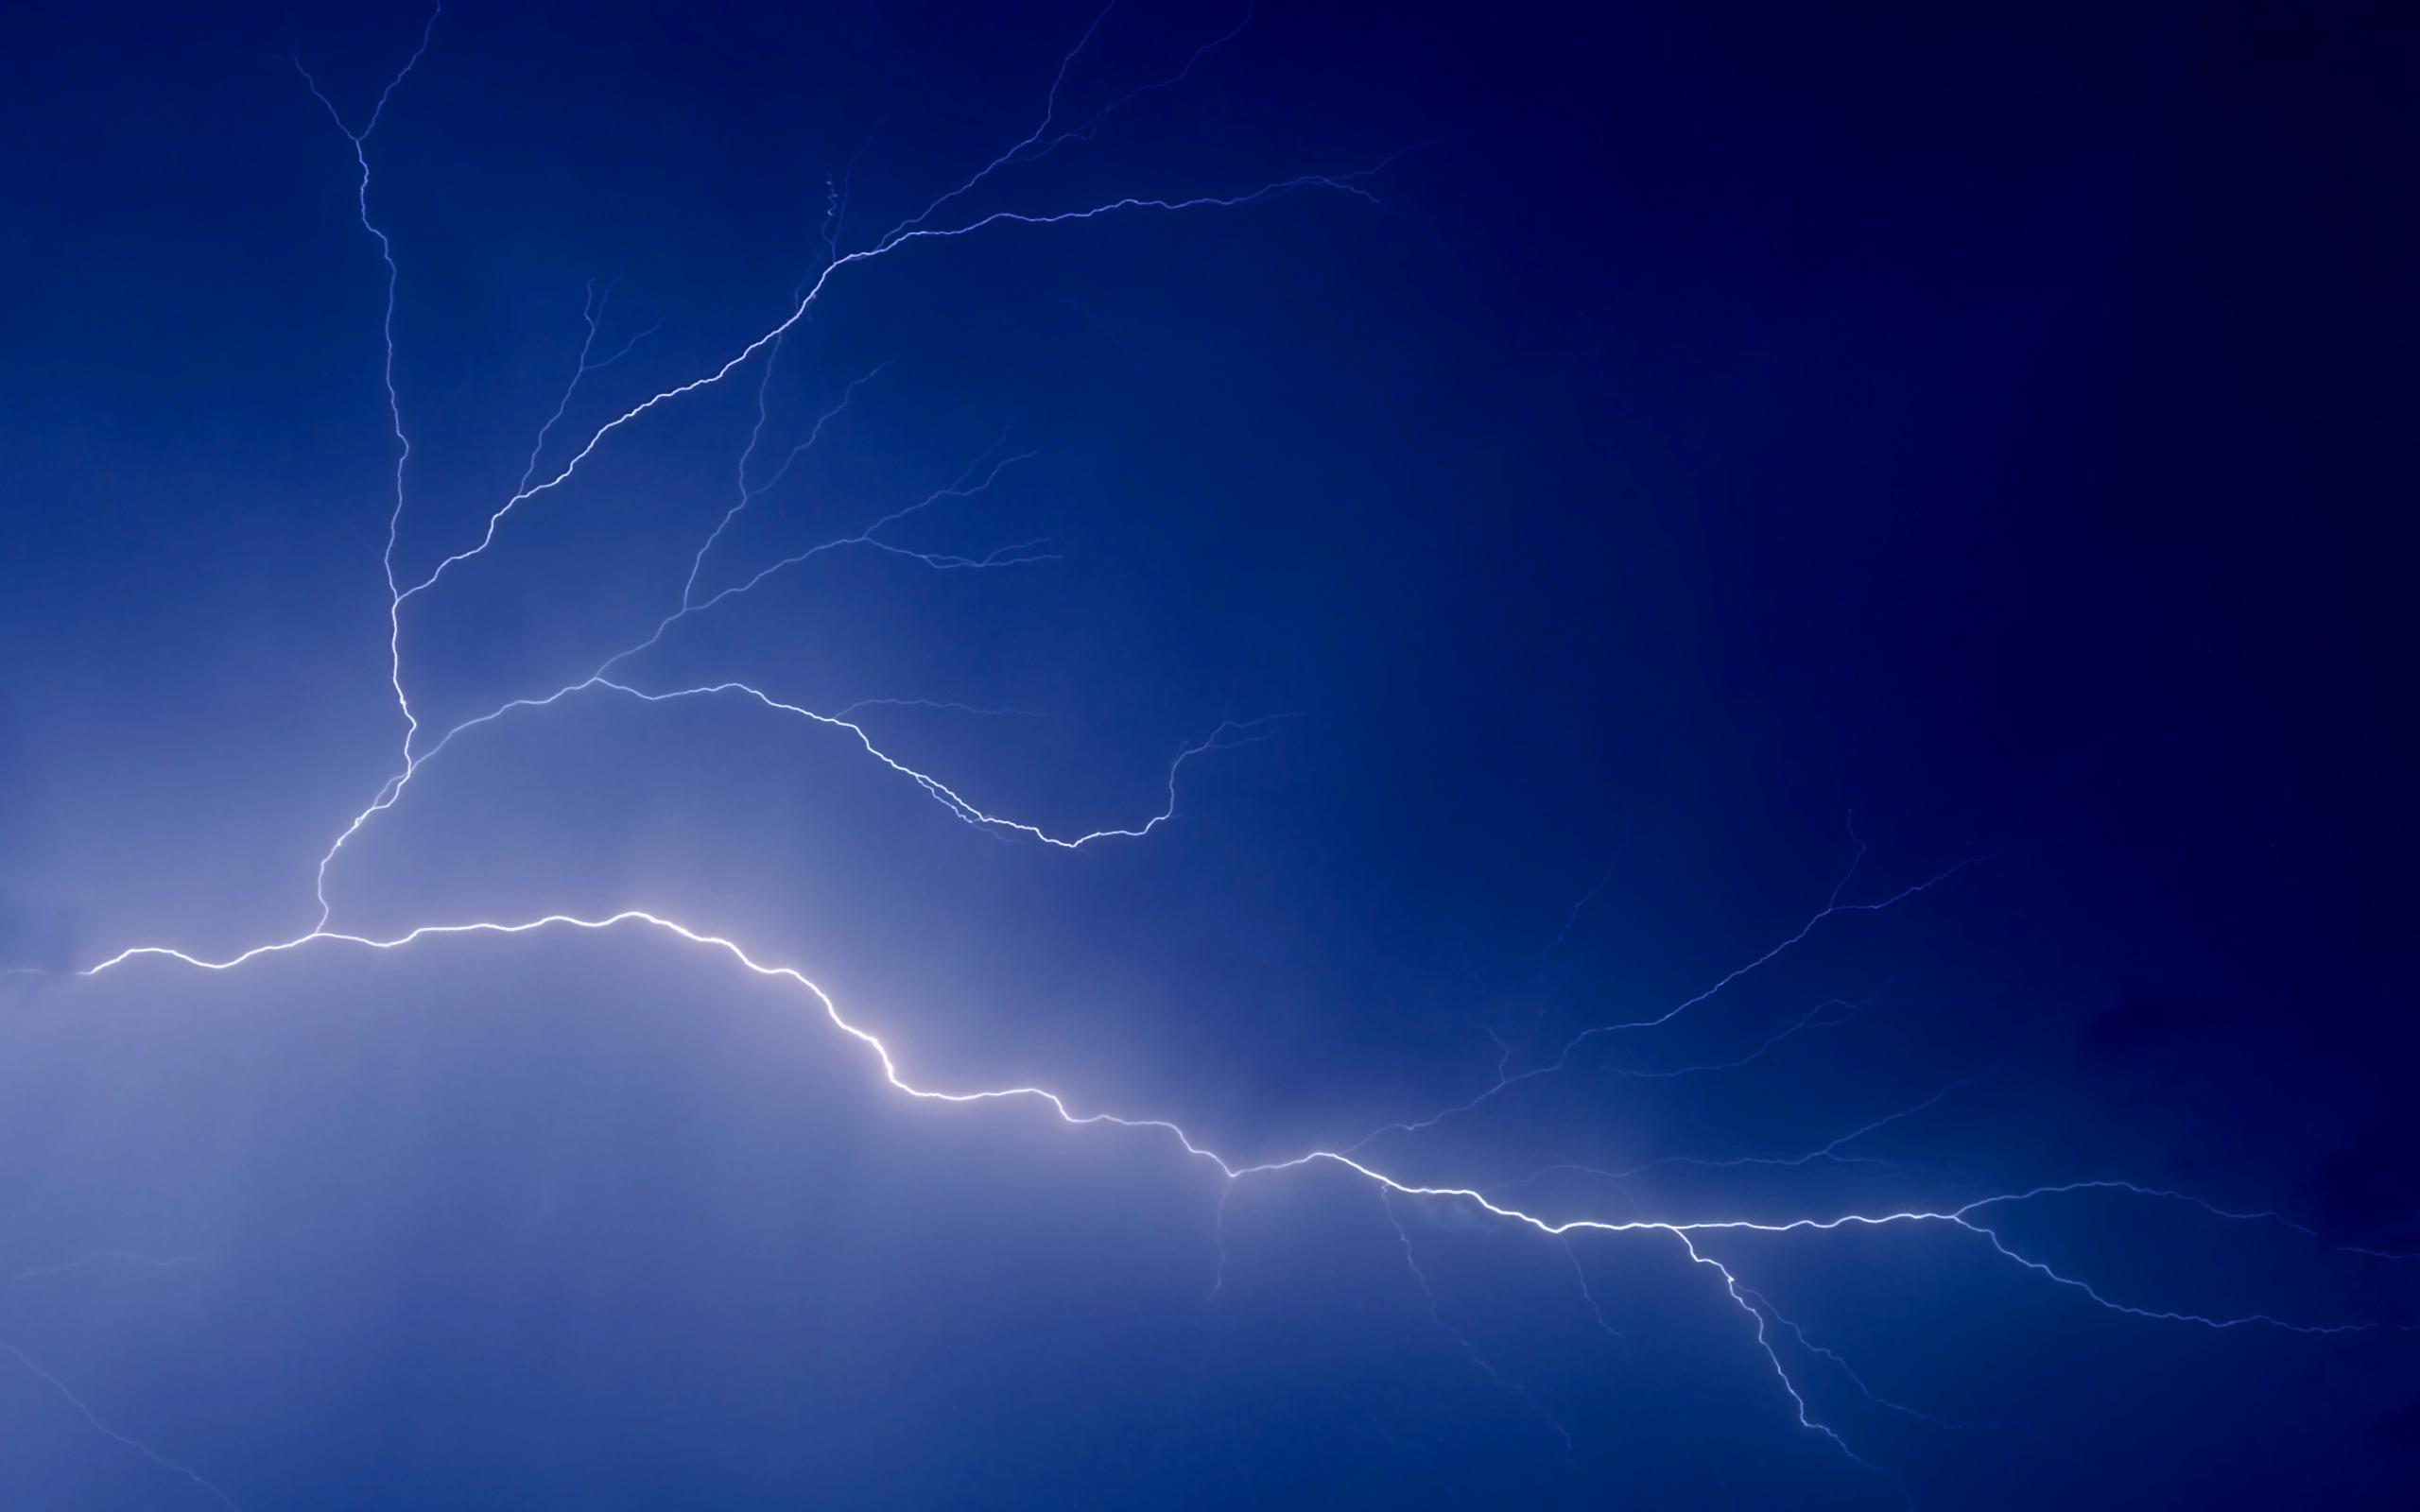 lightning wallpapers free